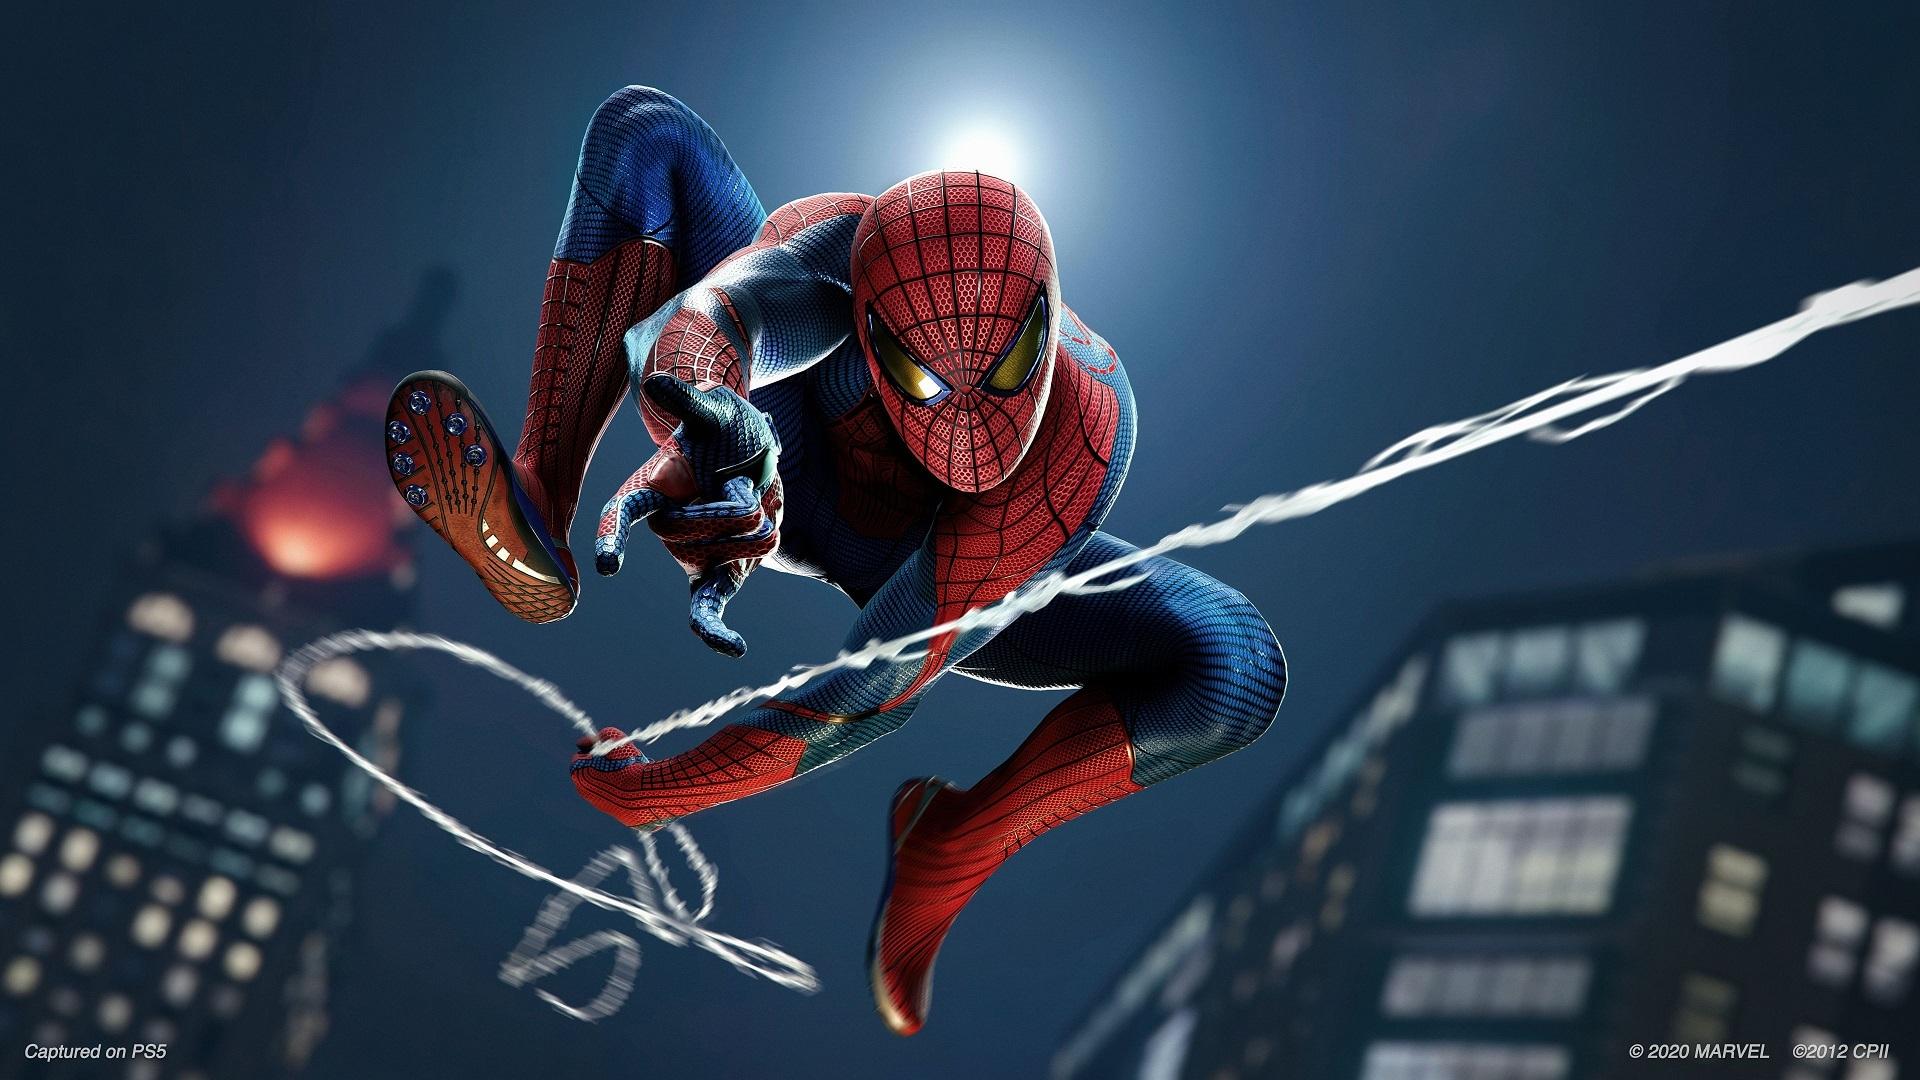 Marvels Spider-Man